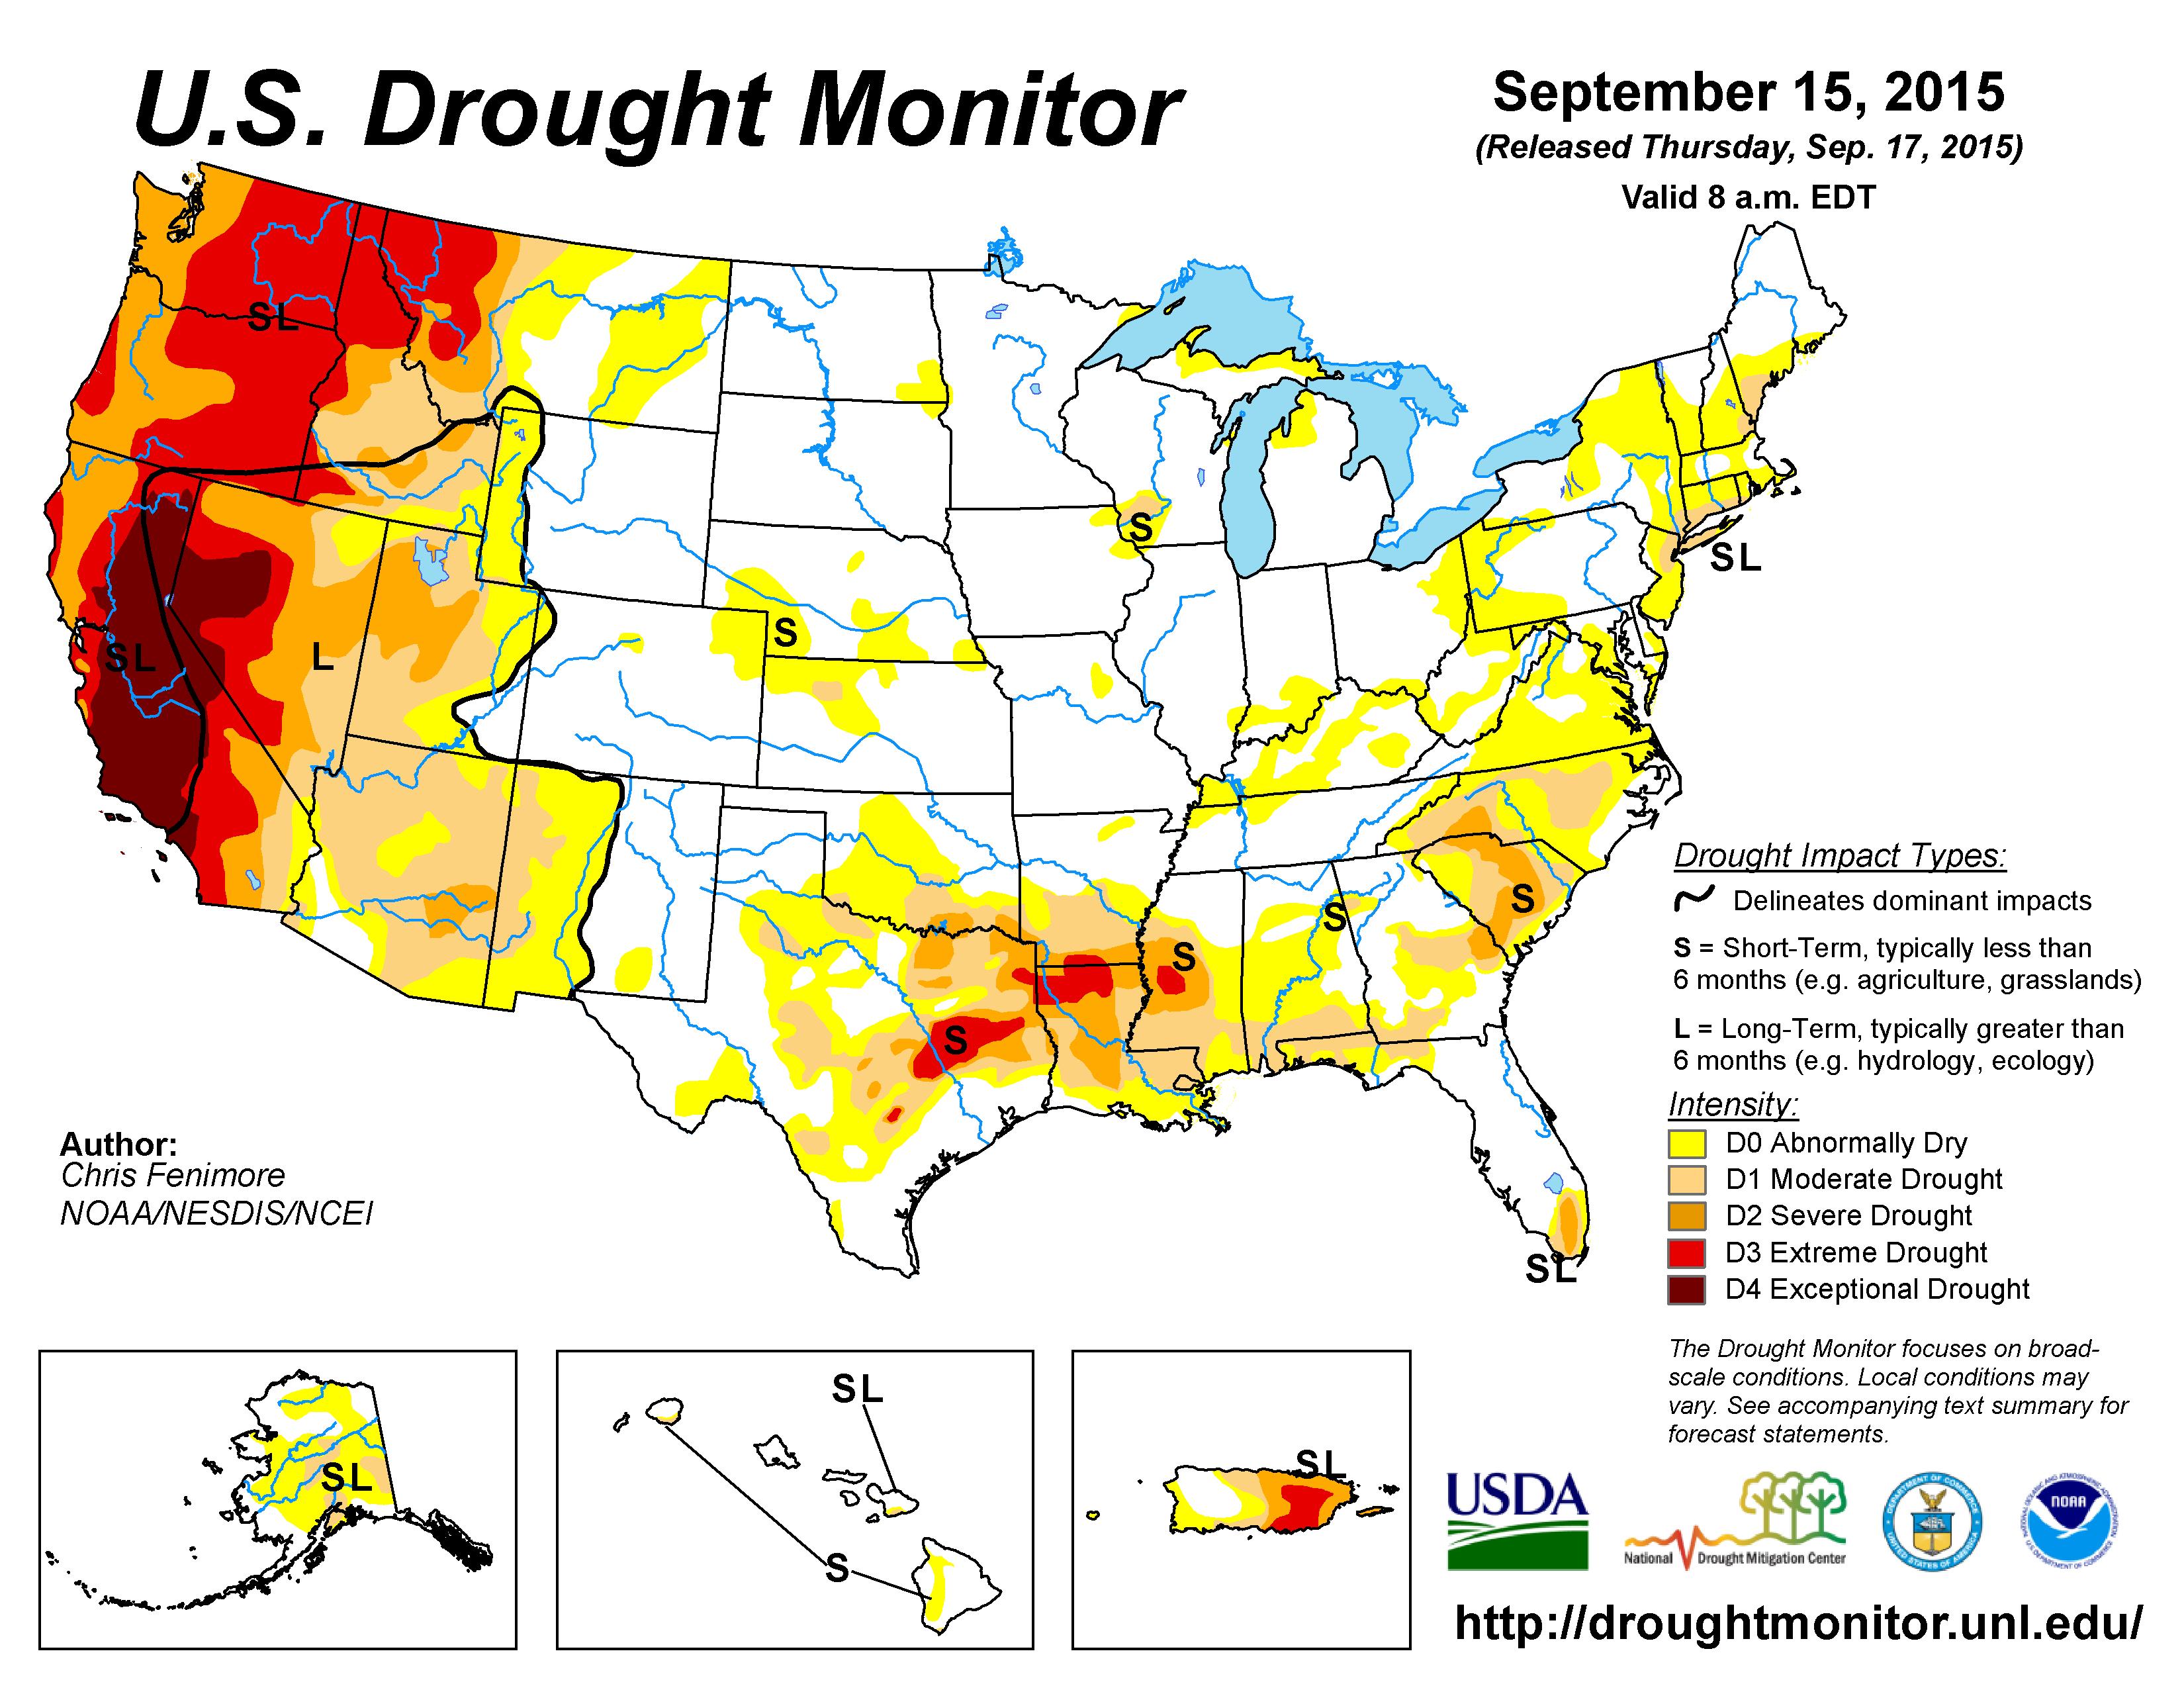 20150915_usdm nation wide drought Sept 15 2015